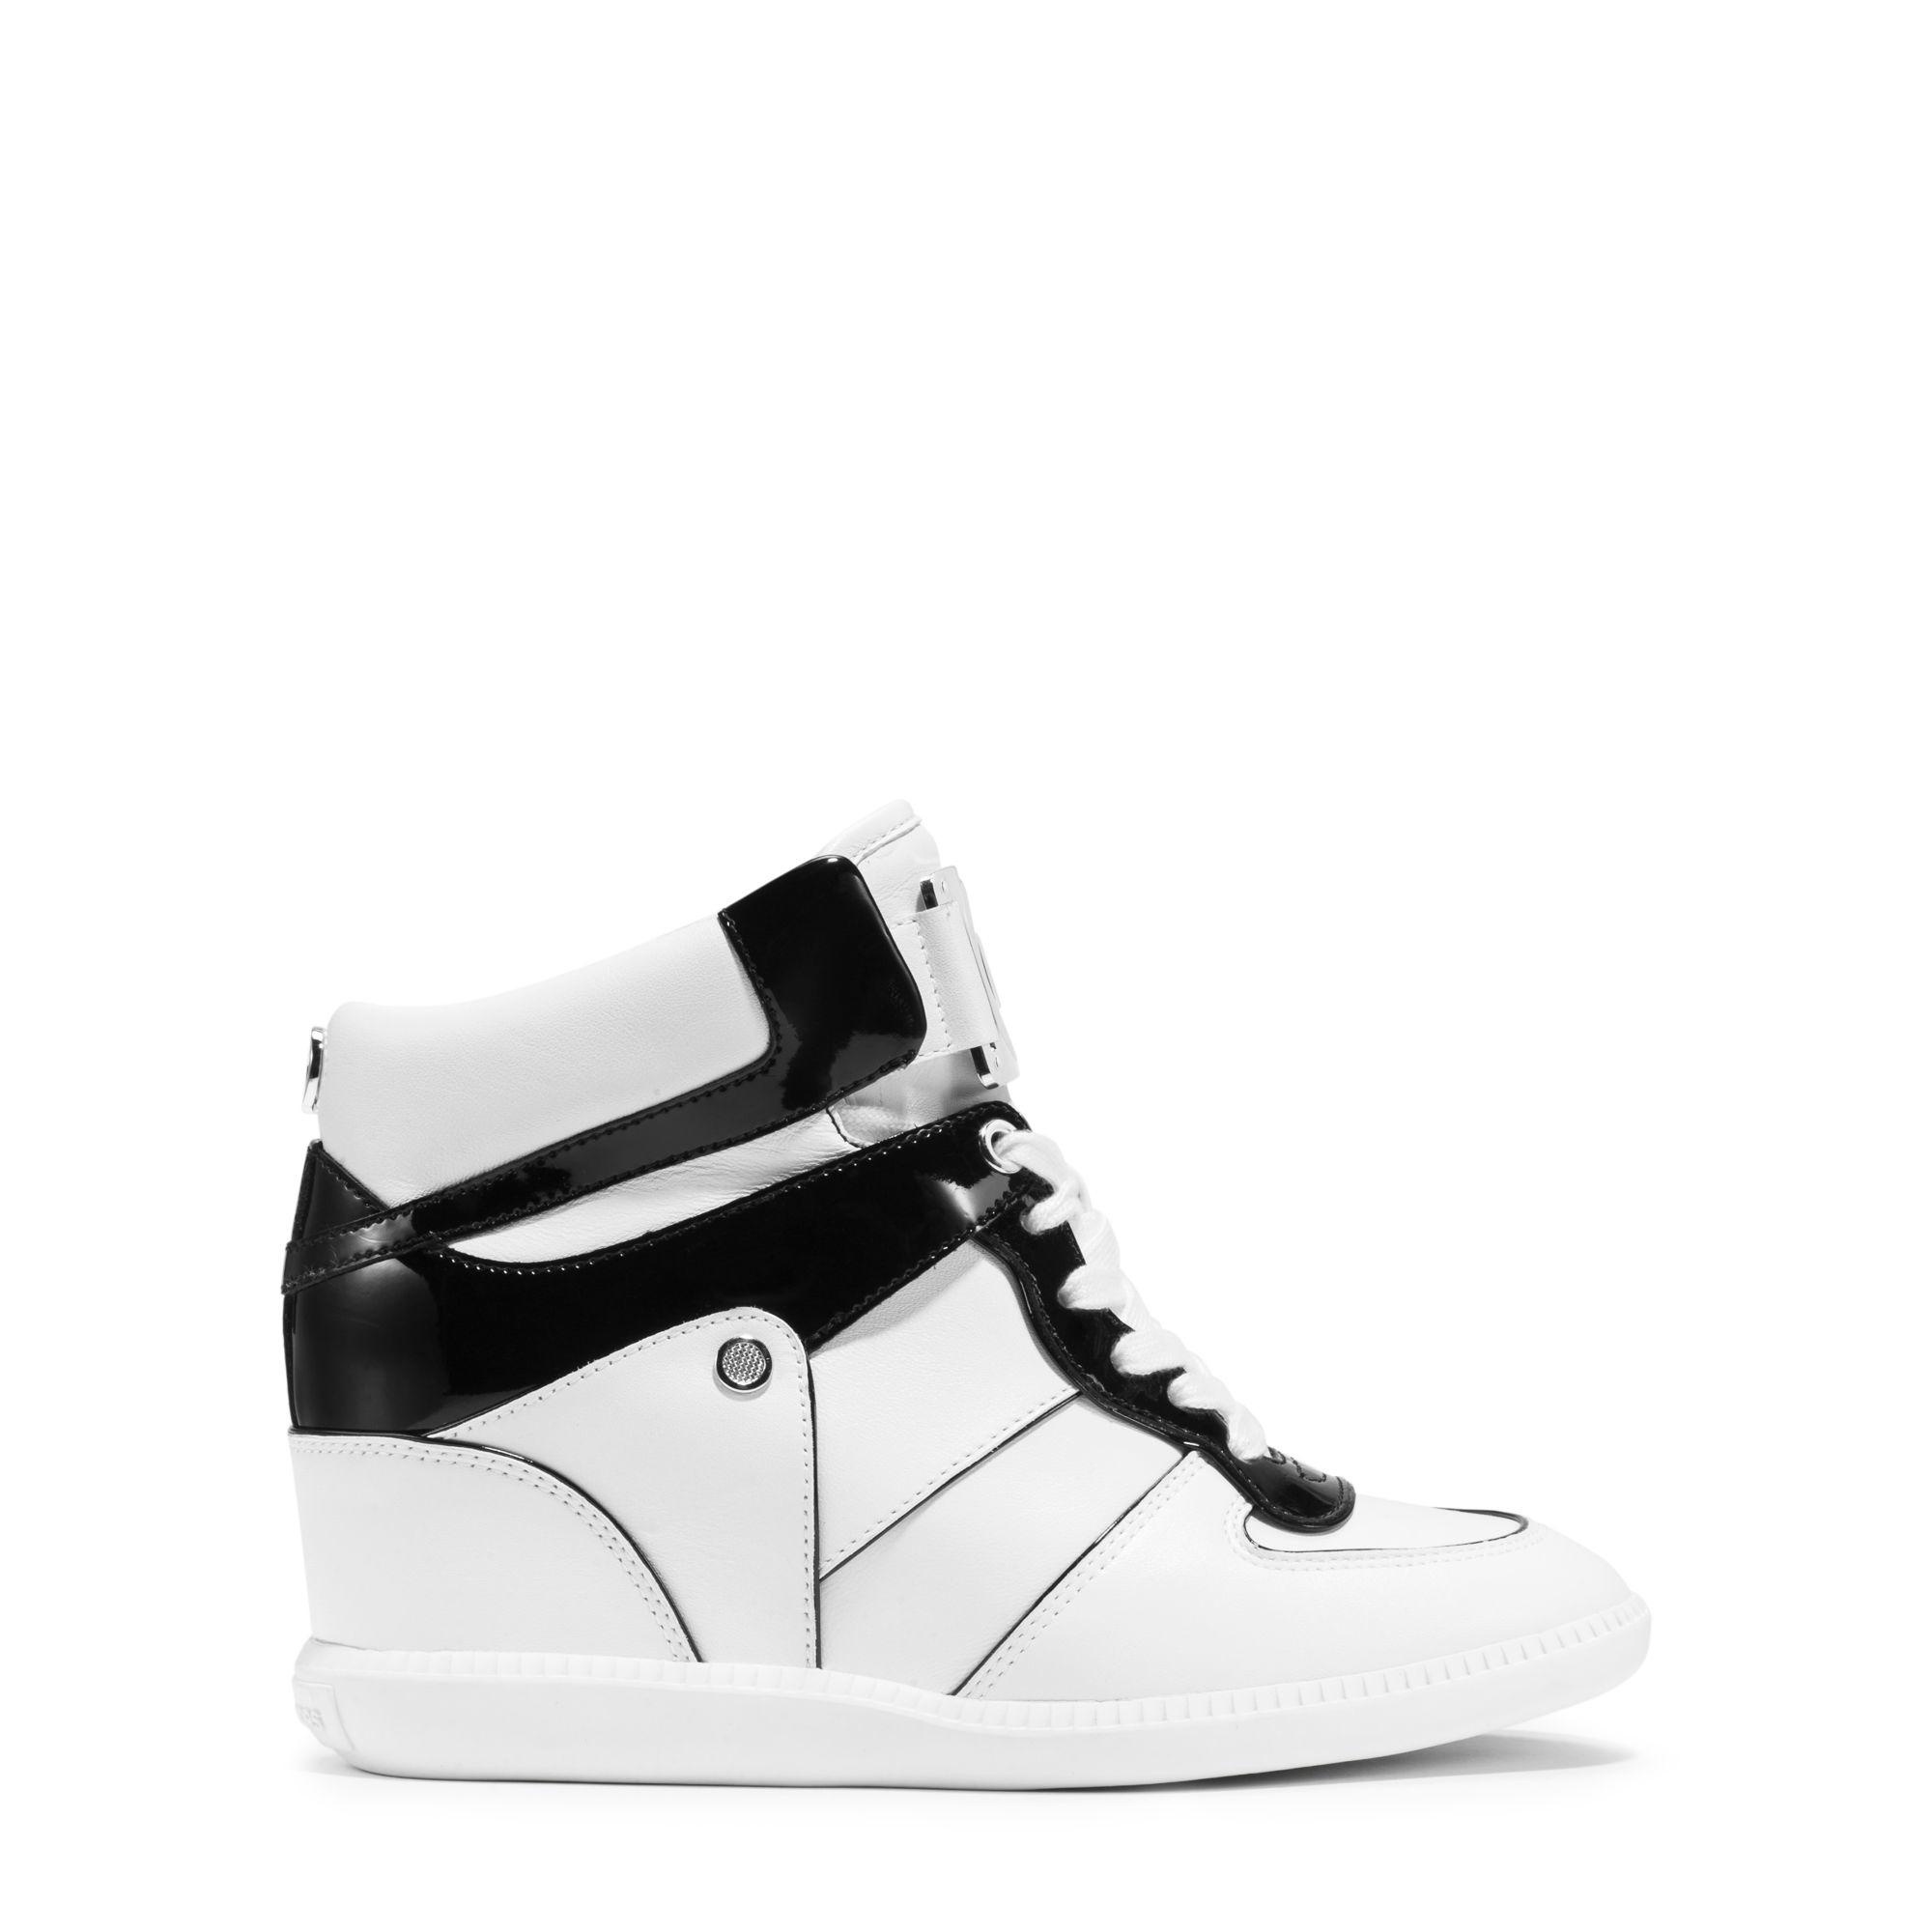 michael kors nikko high top leather sneaker in black lyst. Black Bedroom Furniture Sets. Home Design Ideas